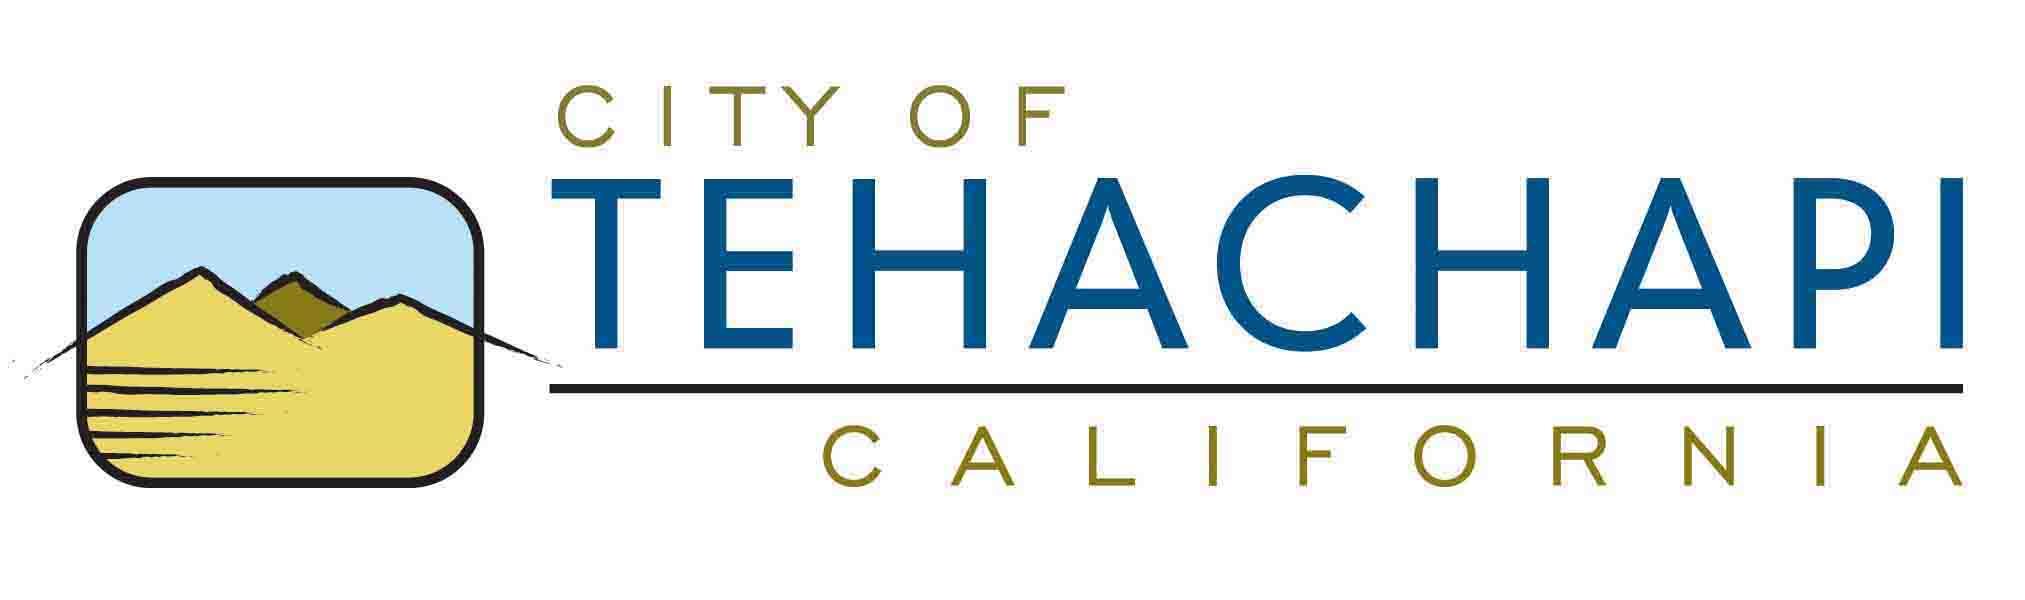 City of Teh